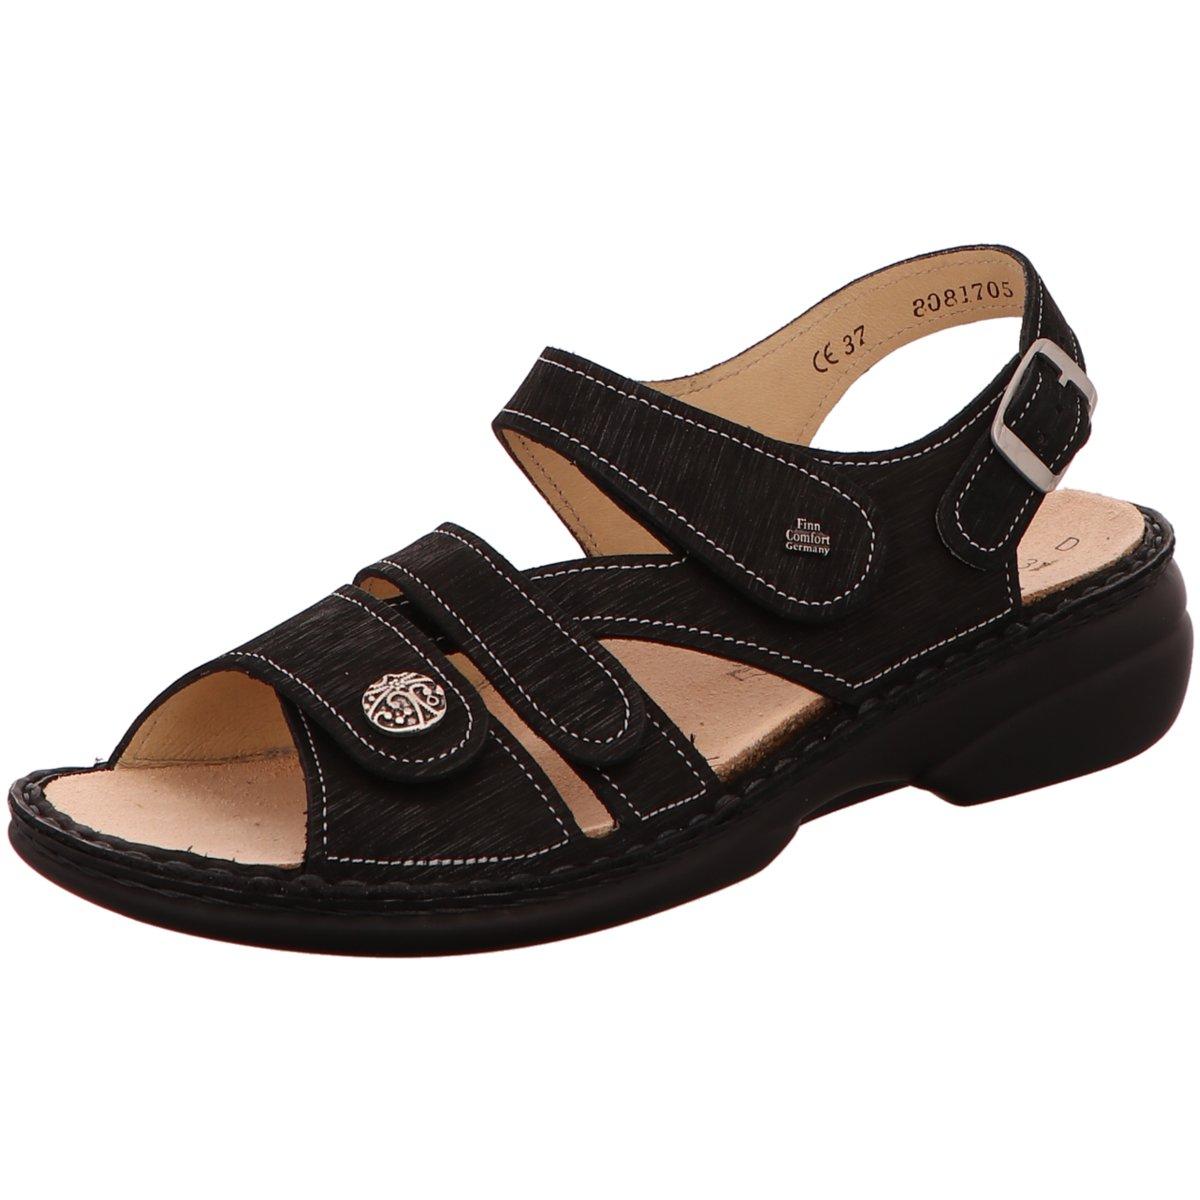 NEU FinnComfort Damen Sandaletten Gomera 02562-589099 schwarz Waving